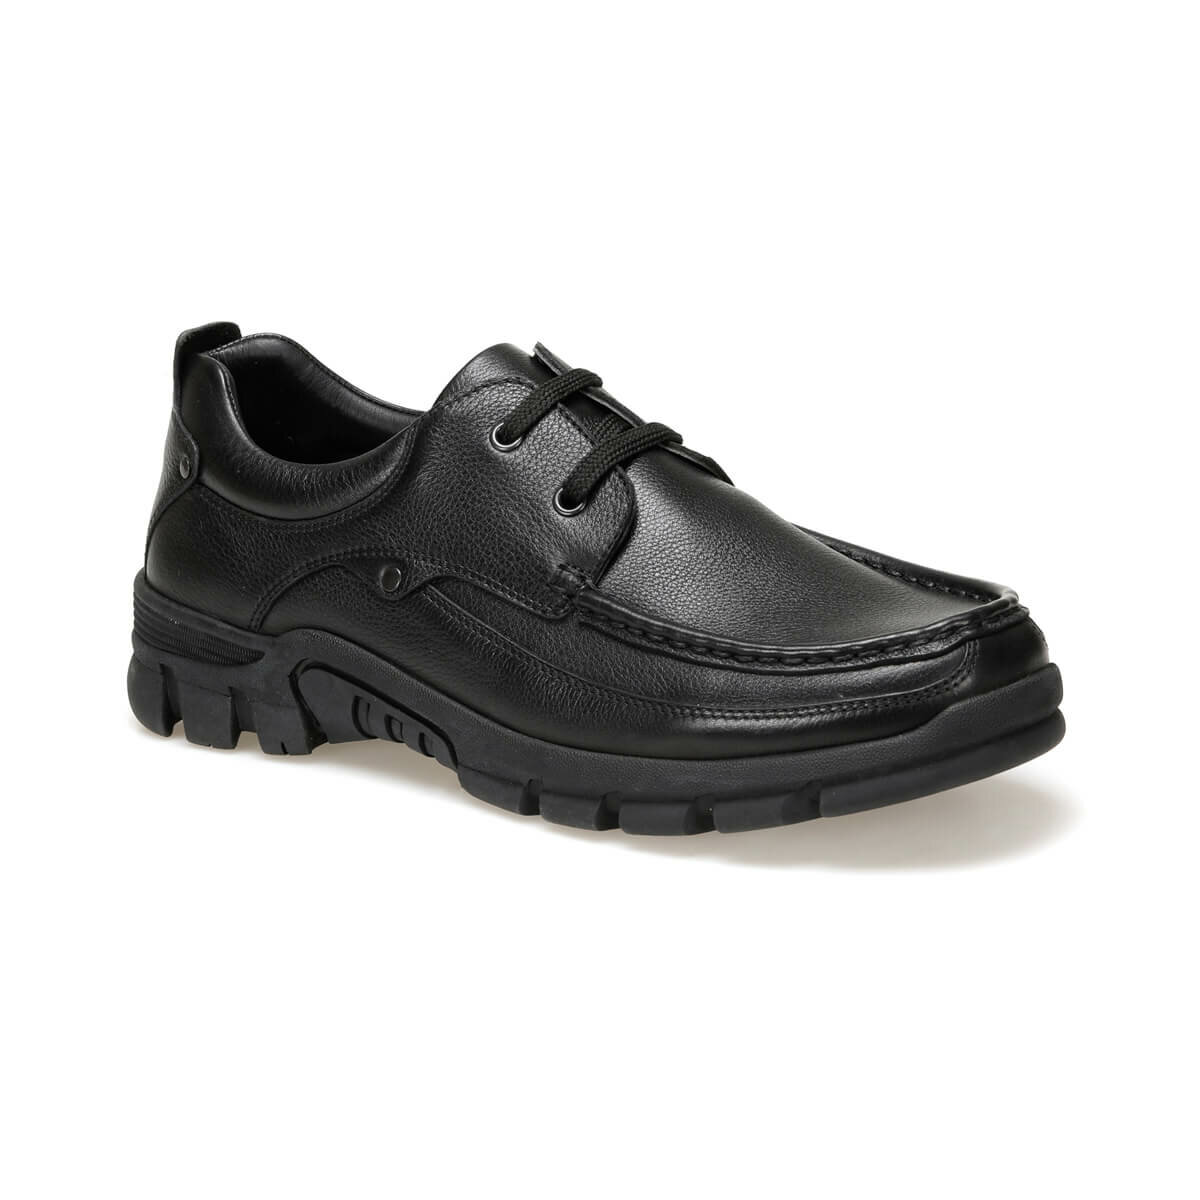 FLO COM-5159 黒人男性の靴 Flogart